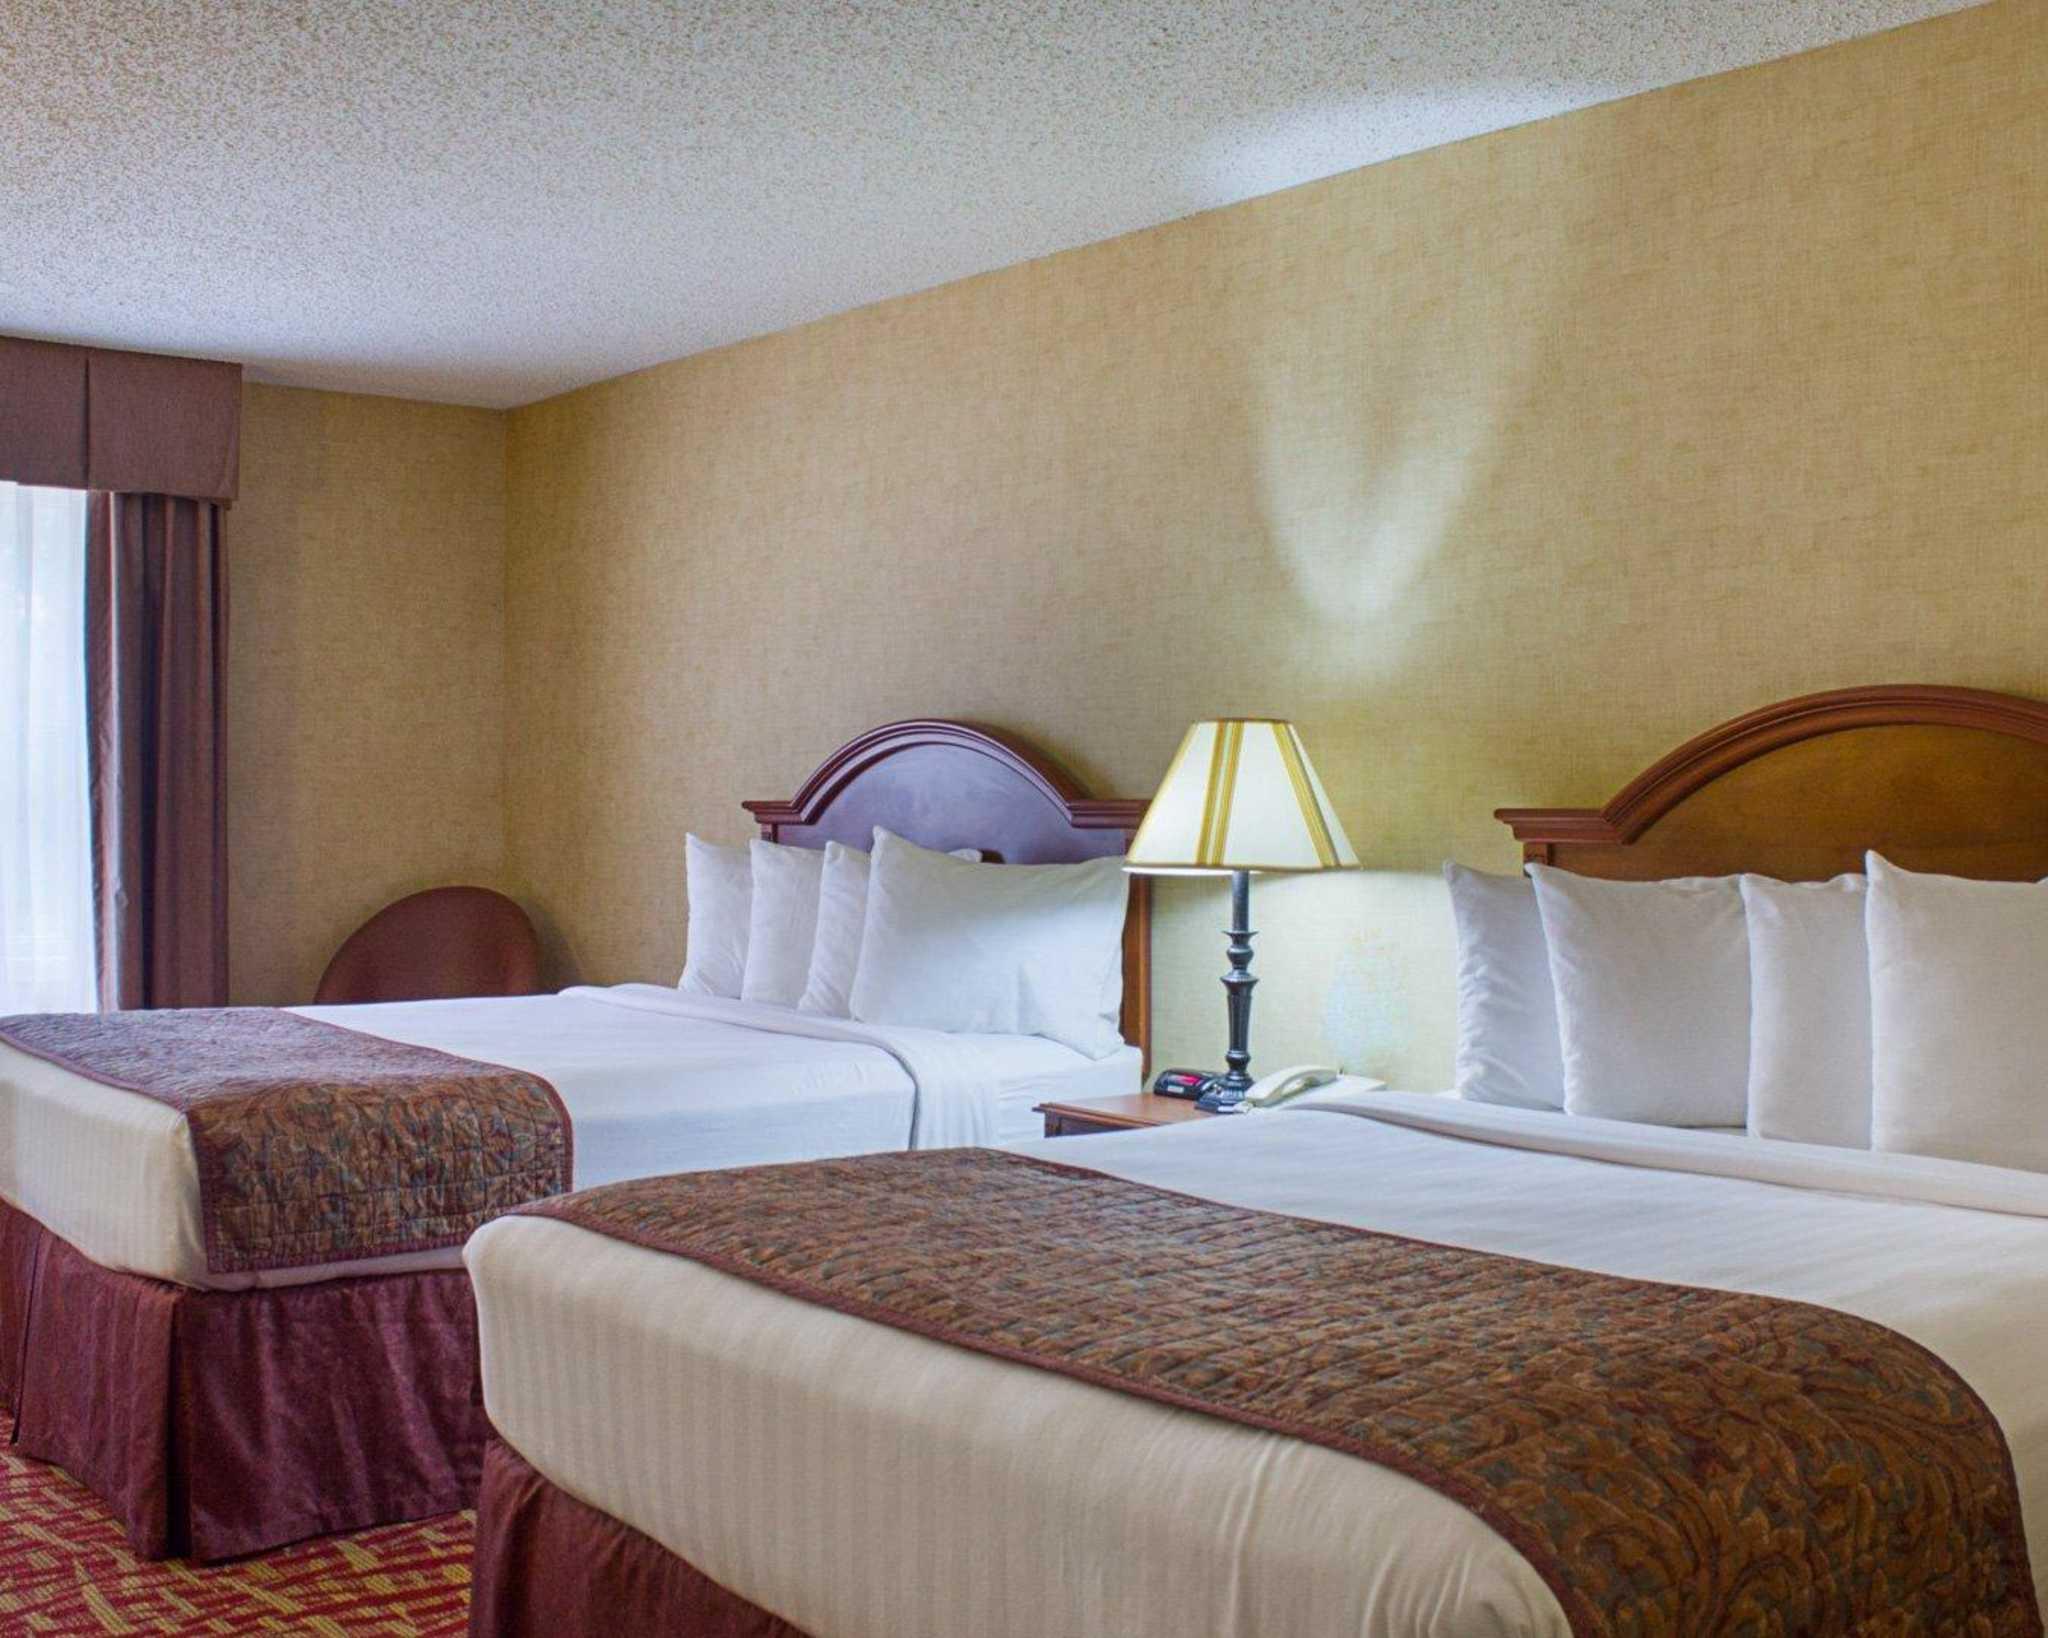 Rodeway Inn image 44